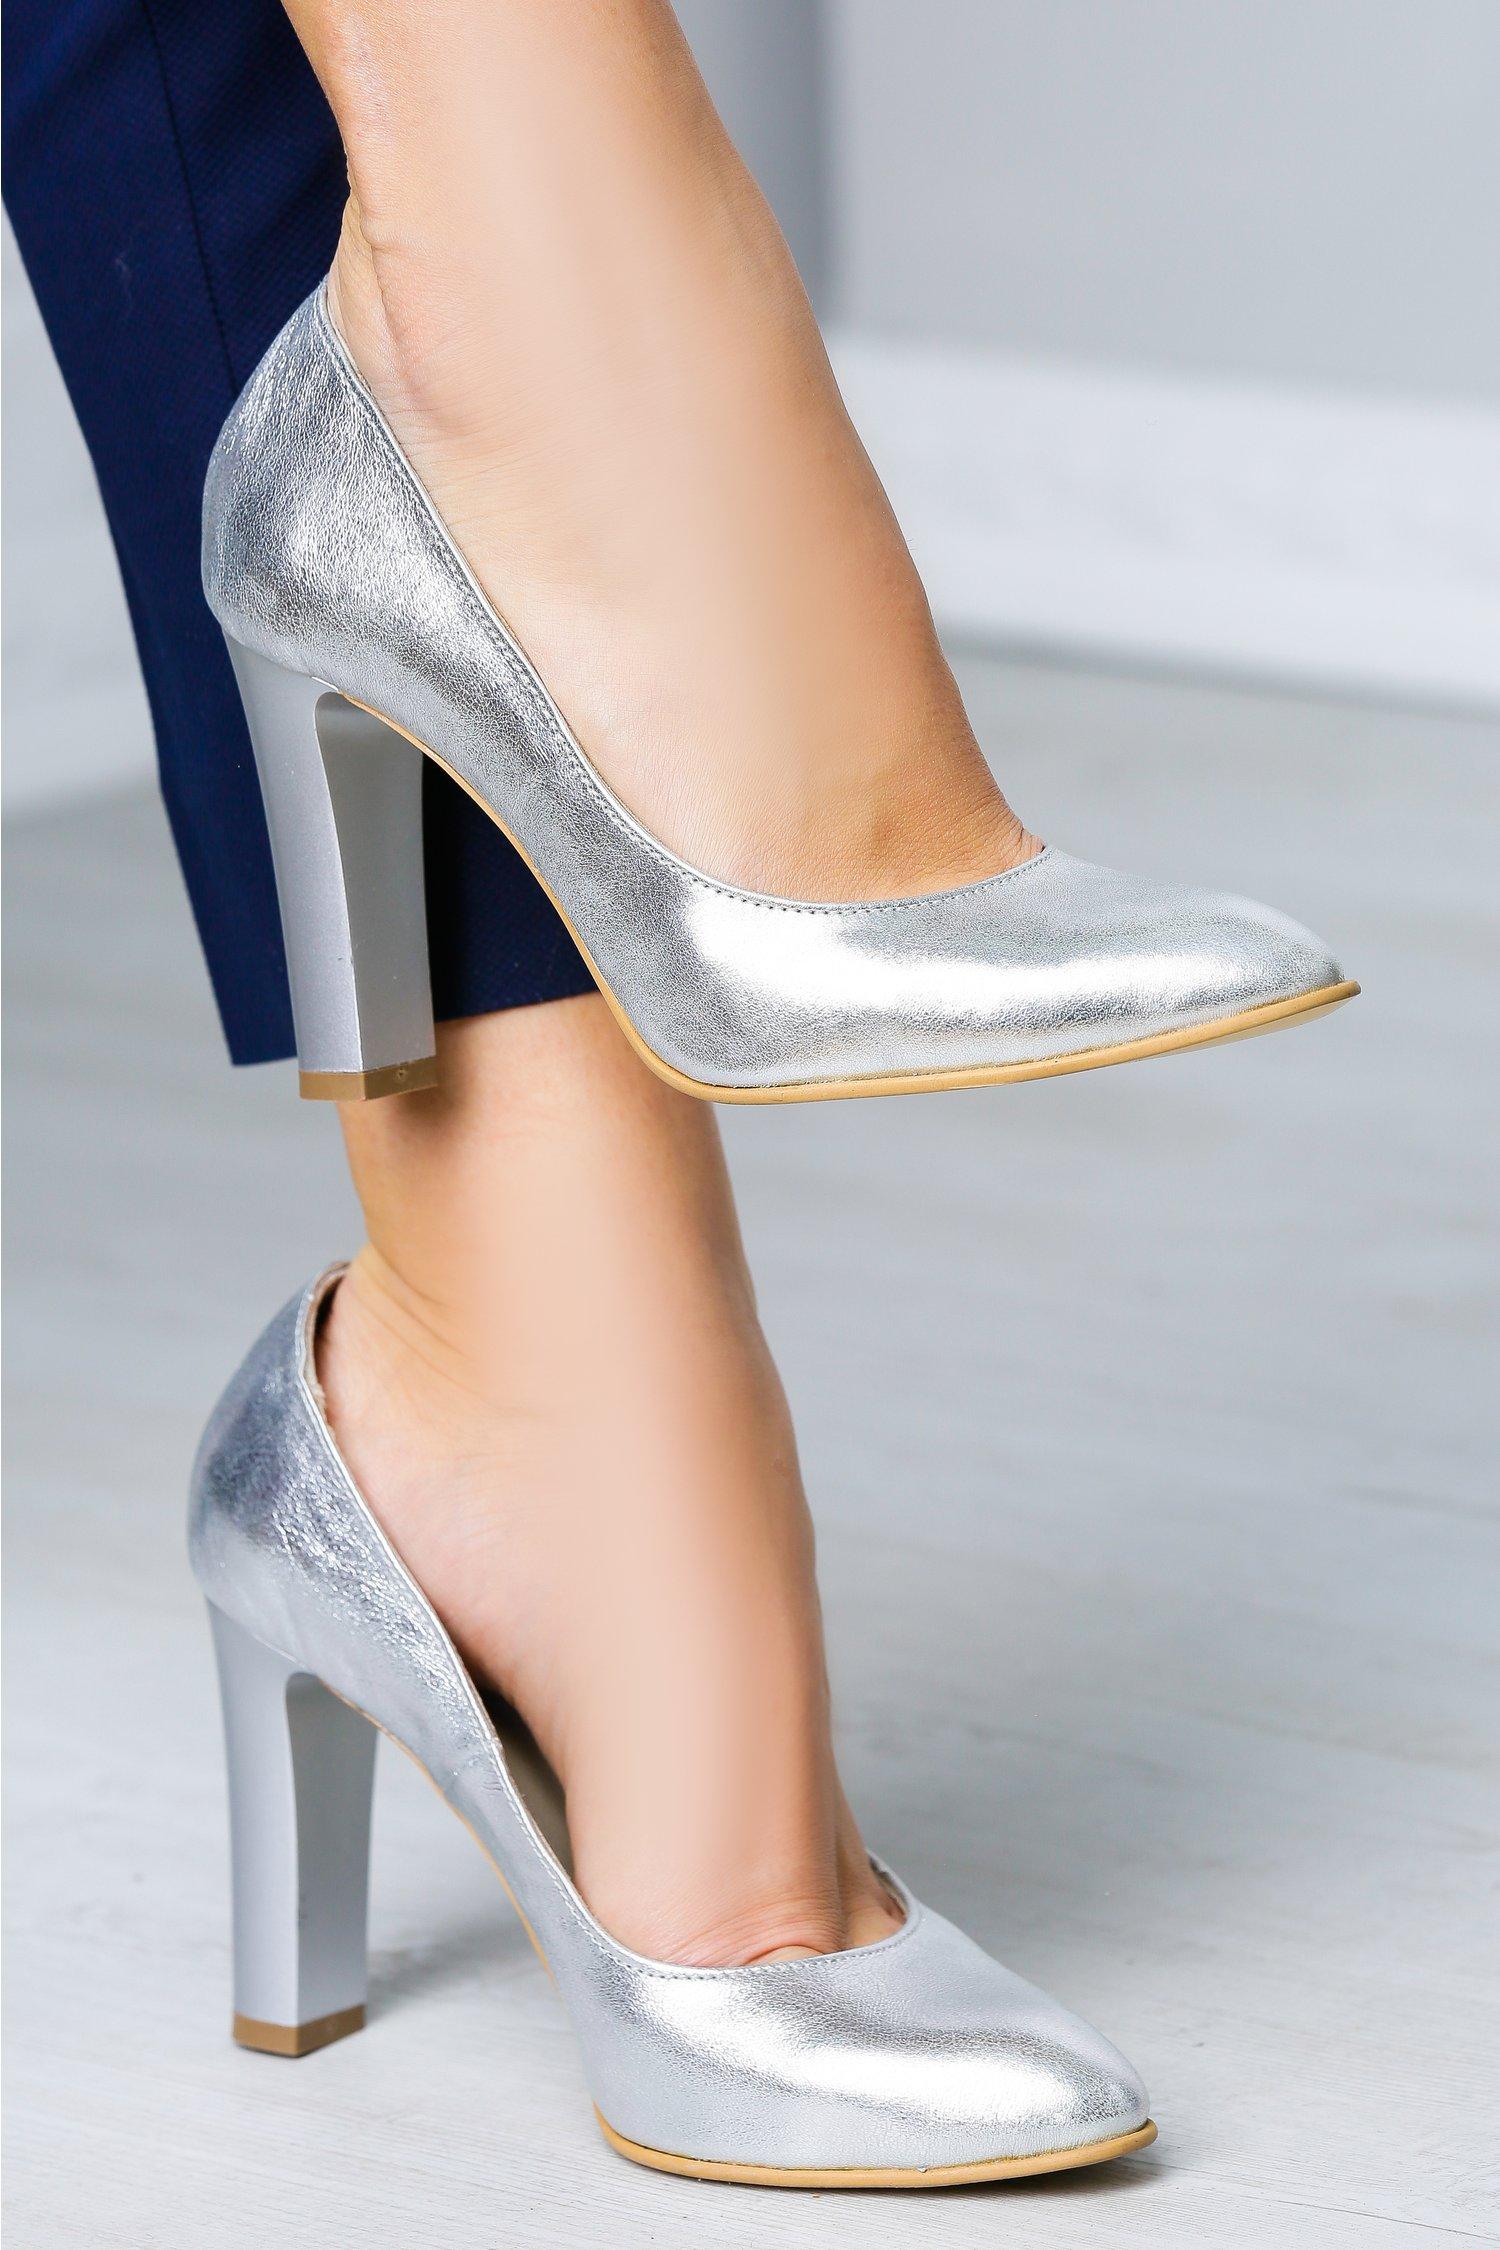 Magazin Online Haine - Pantofi Arabela argintiu de ocazie -Fashion-4u.Eu